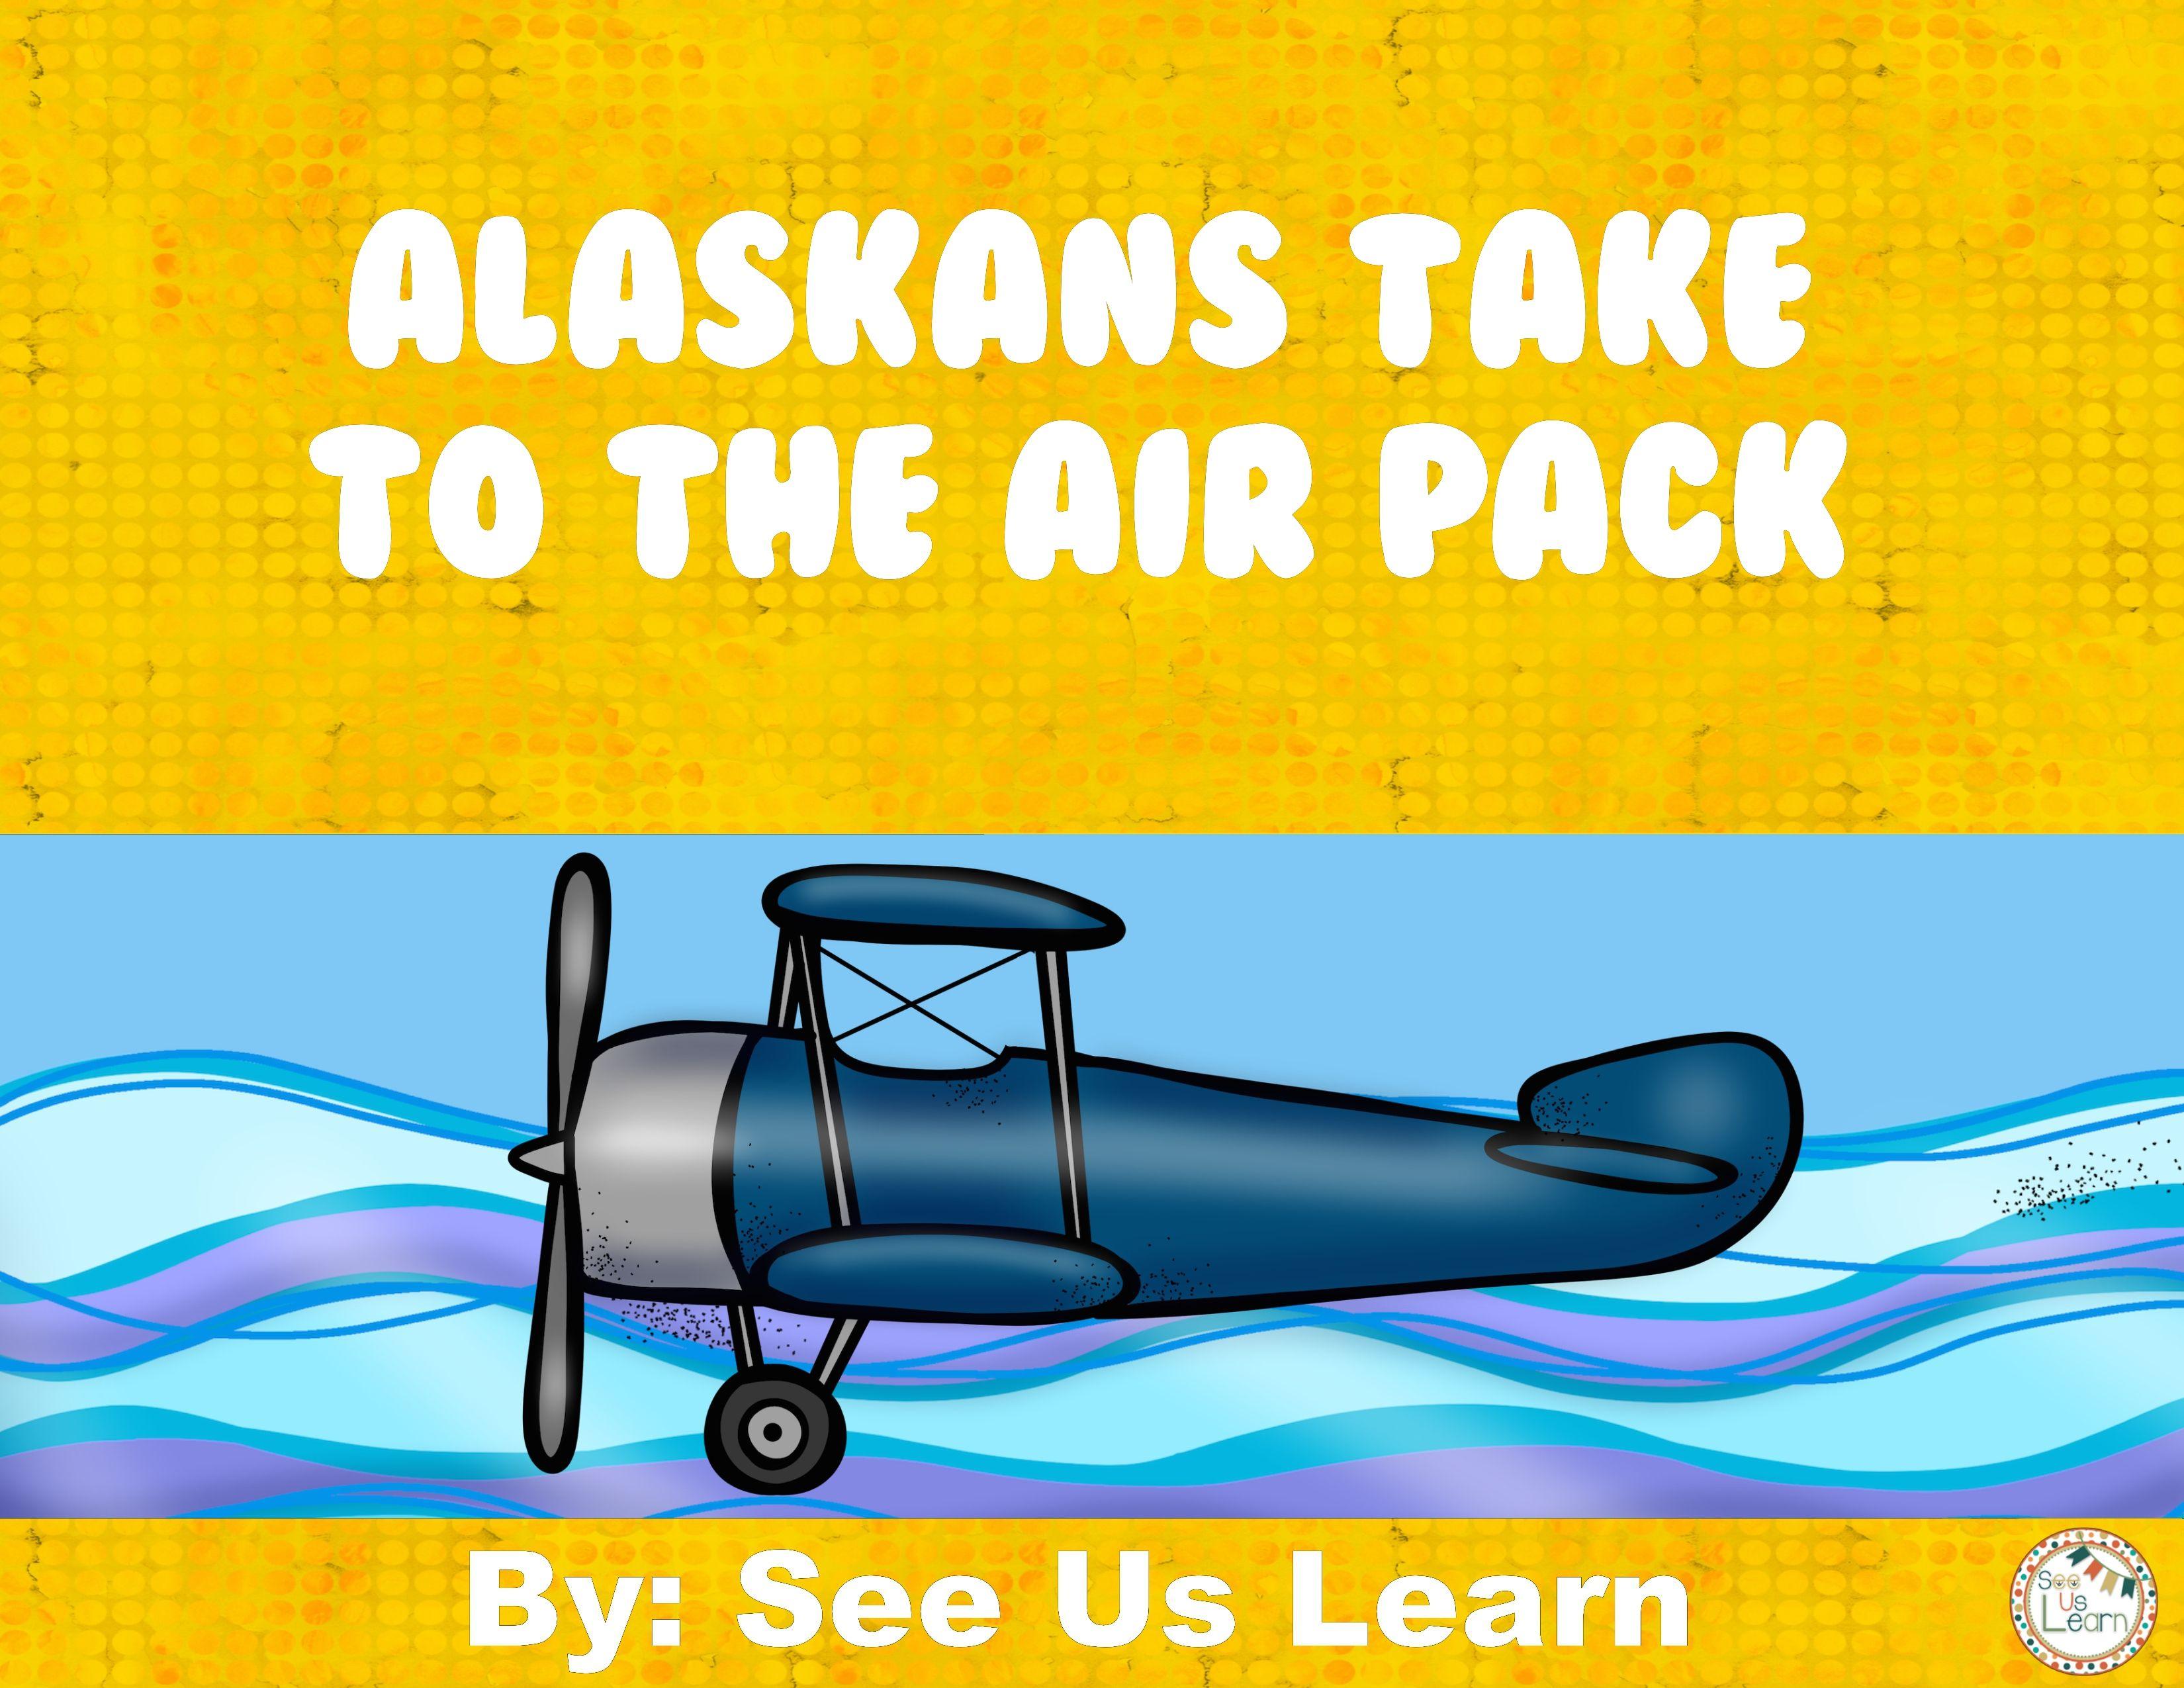 Alaskans Take To The Air Pack Teaching Upper Elementary Classroom